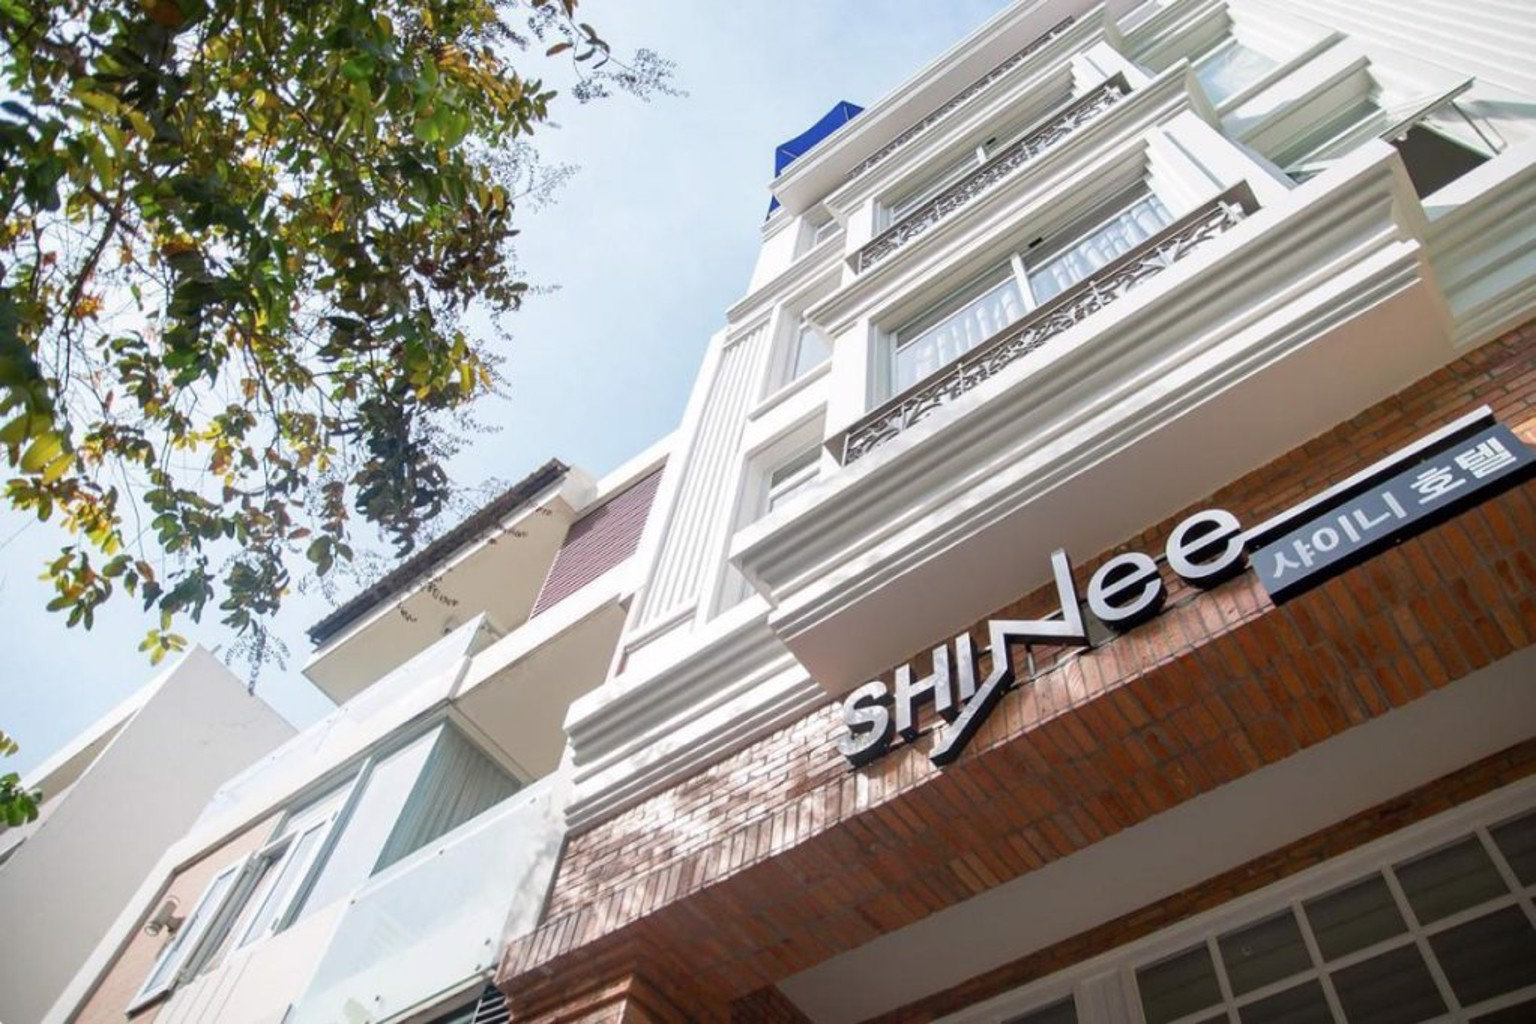 Shinee Hotel